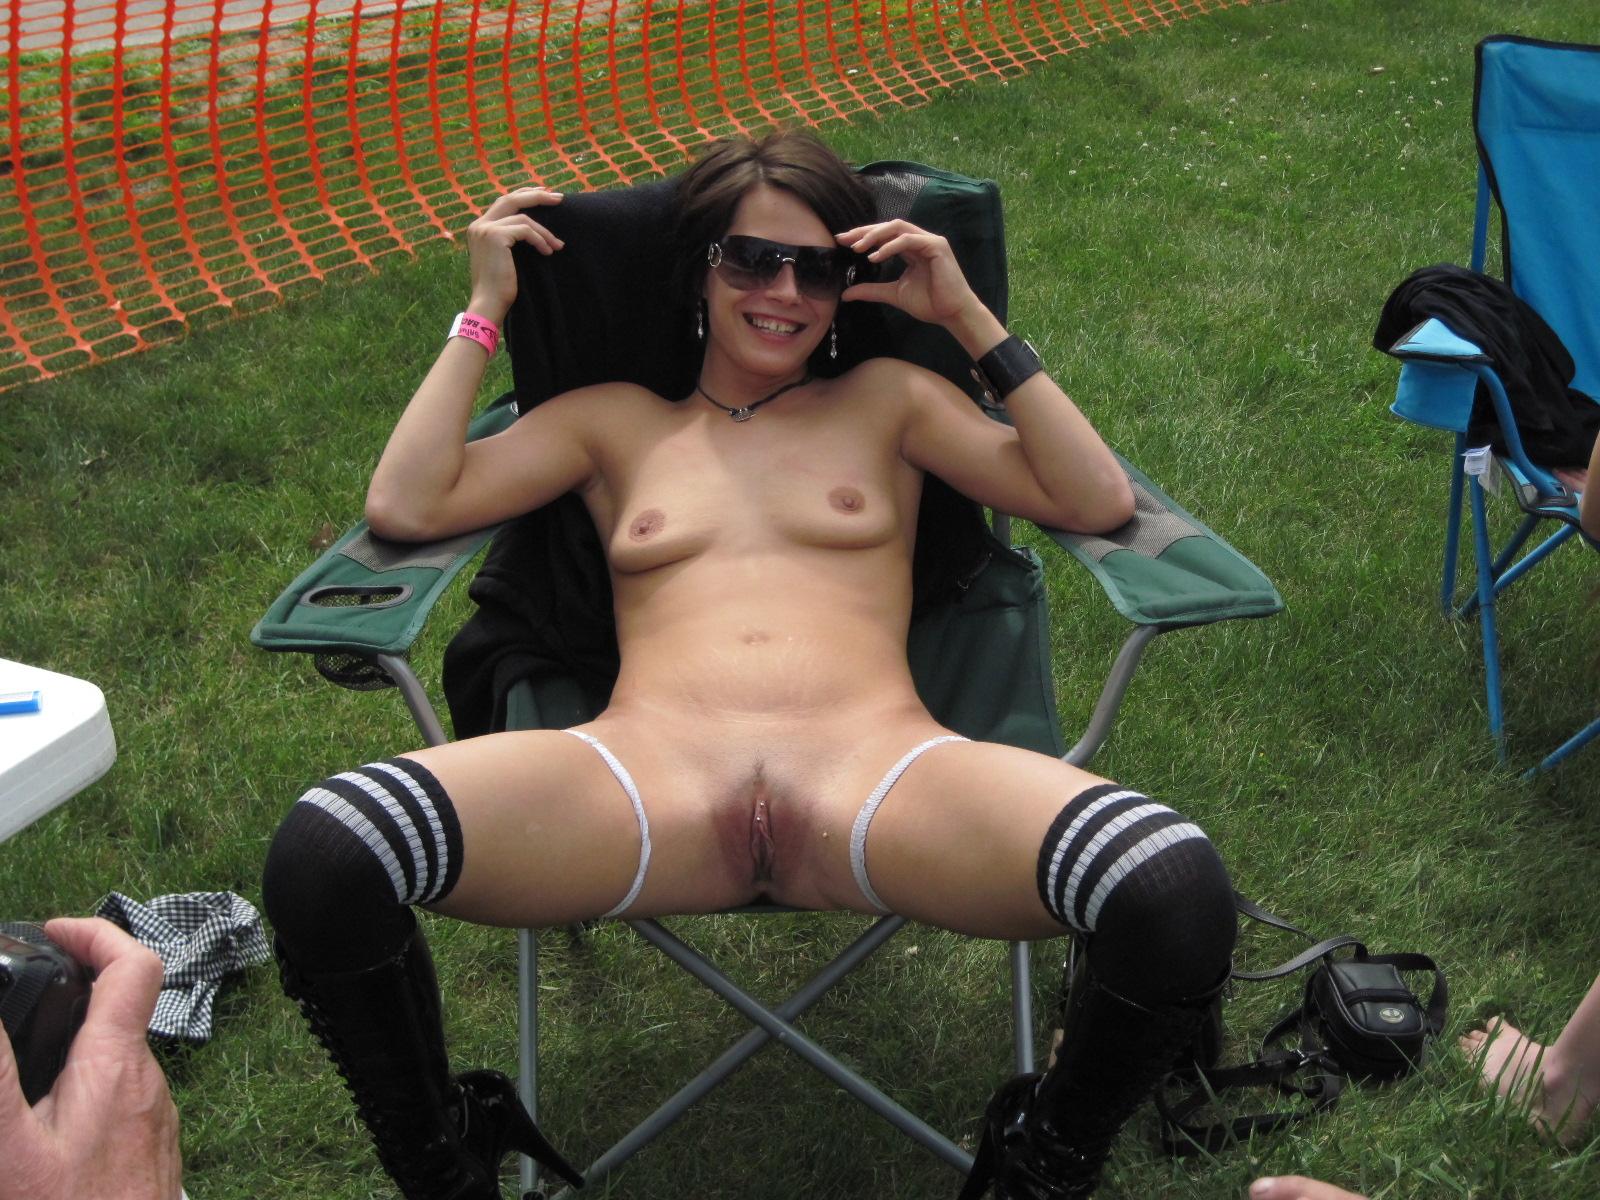 Slutty nude photos